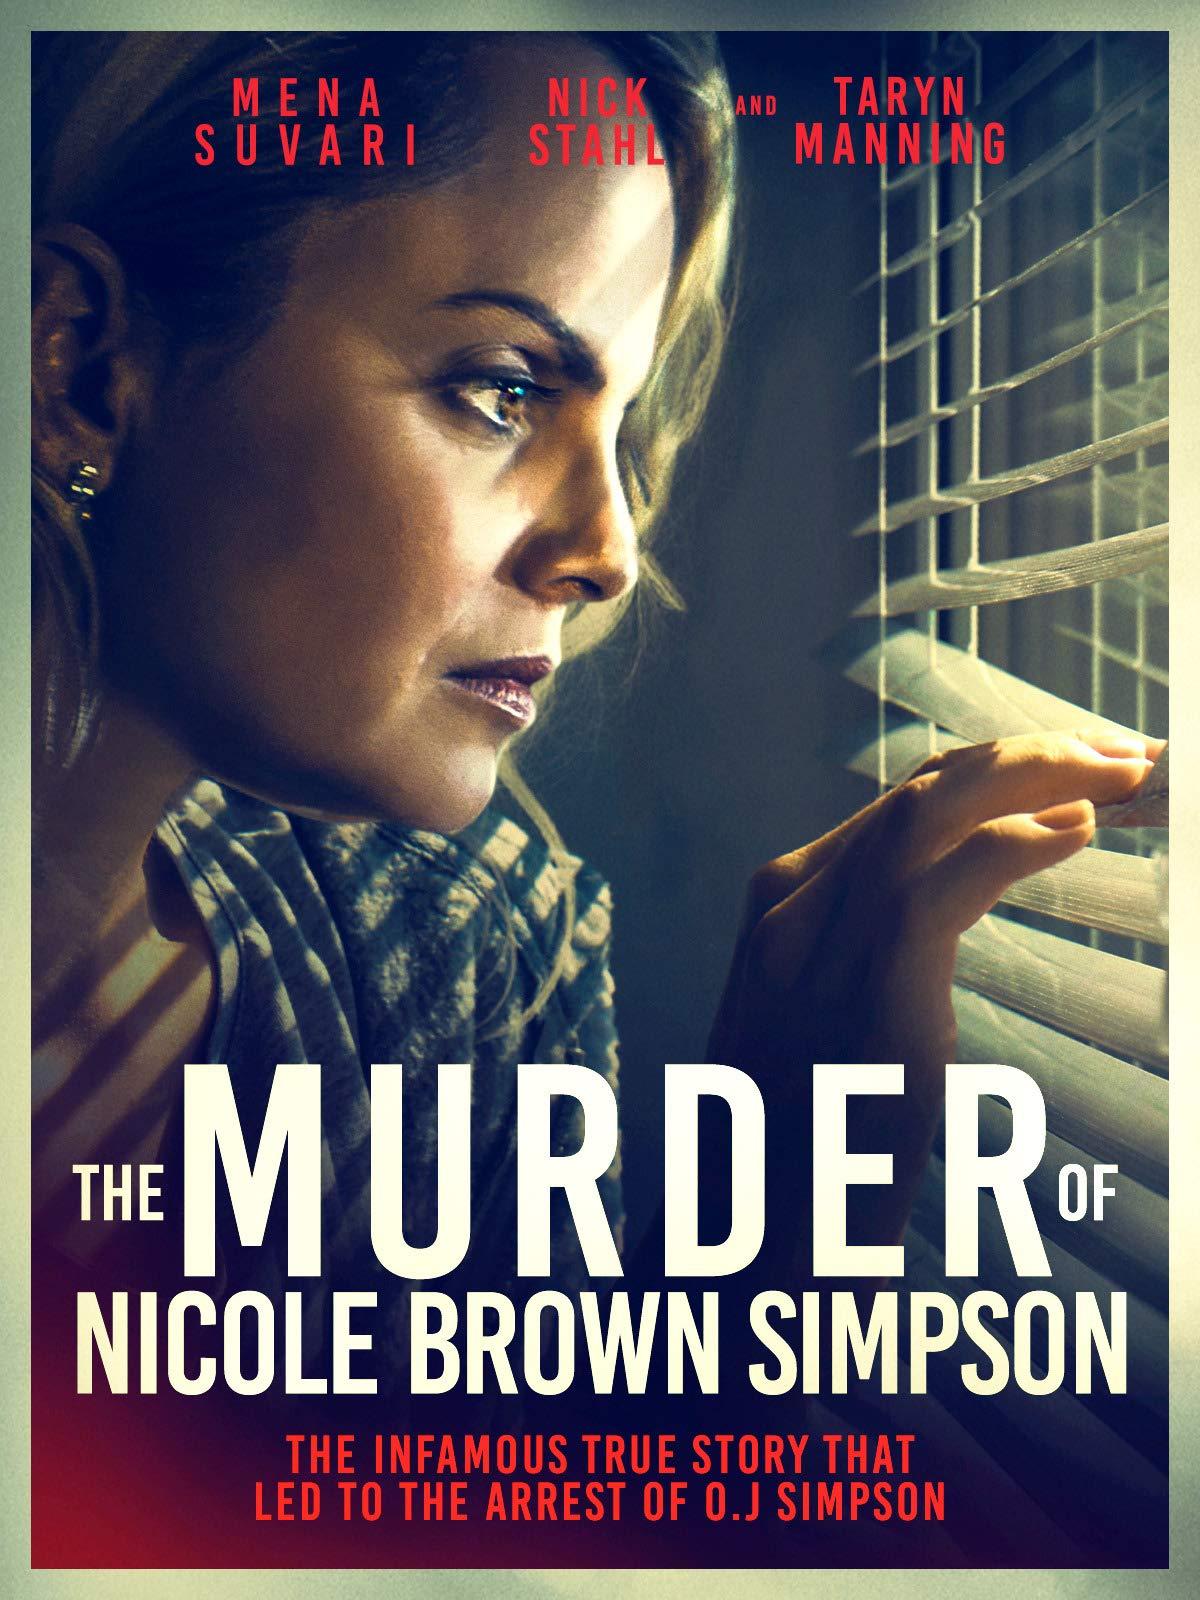 Murder of nicole brown simpson